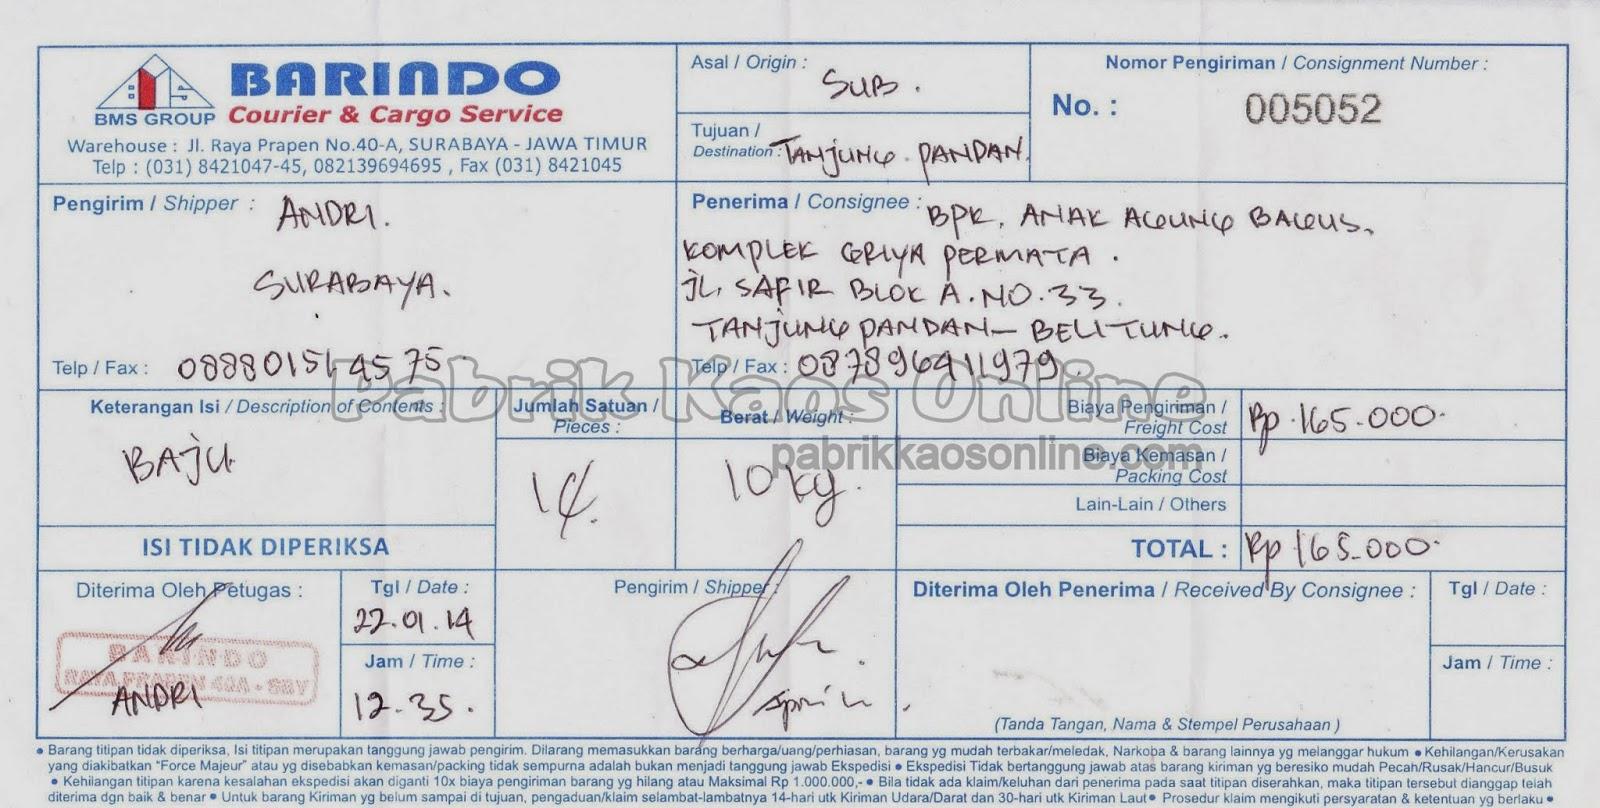 nota kirim belitung via Barindo